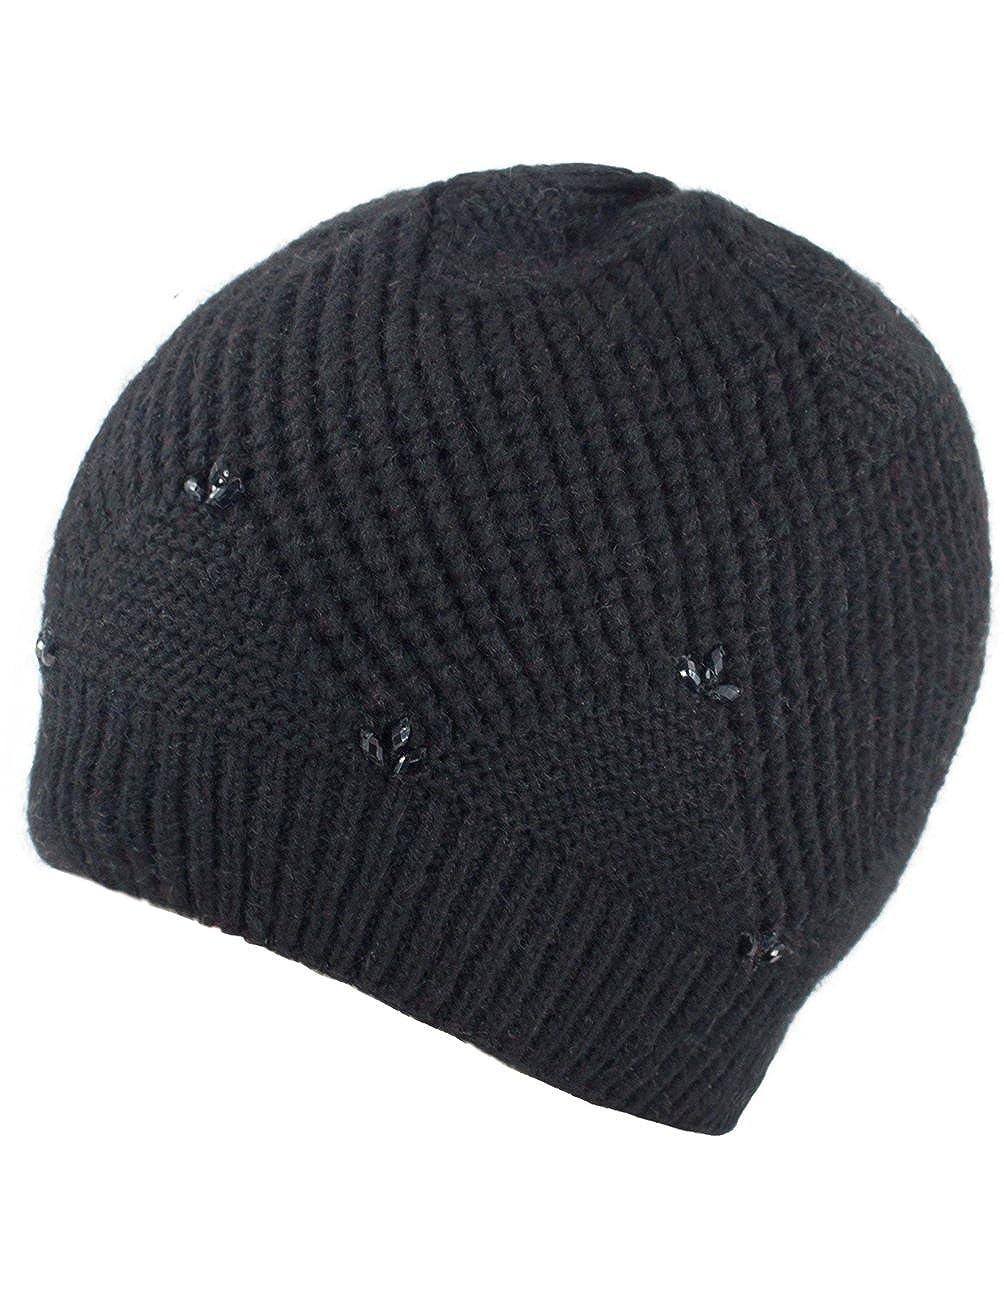 Dahlia Women s Angora Blend Beaded Slouch Beanie Winter Hat Dual Layer 10a0041008a